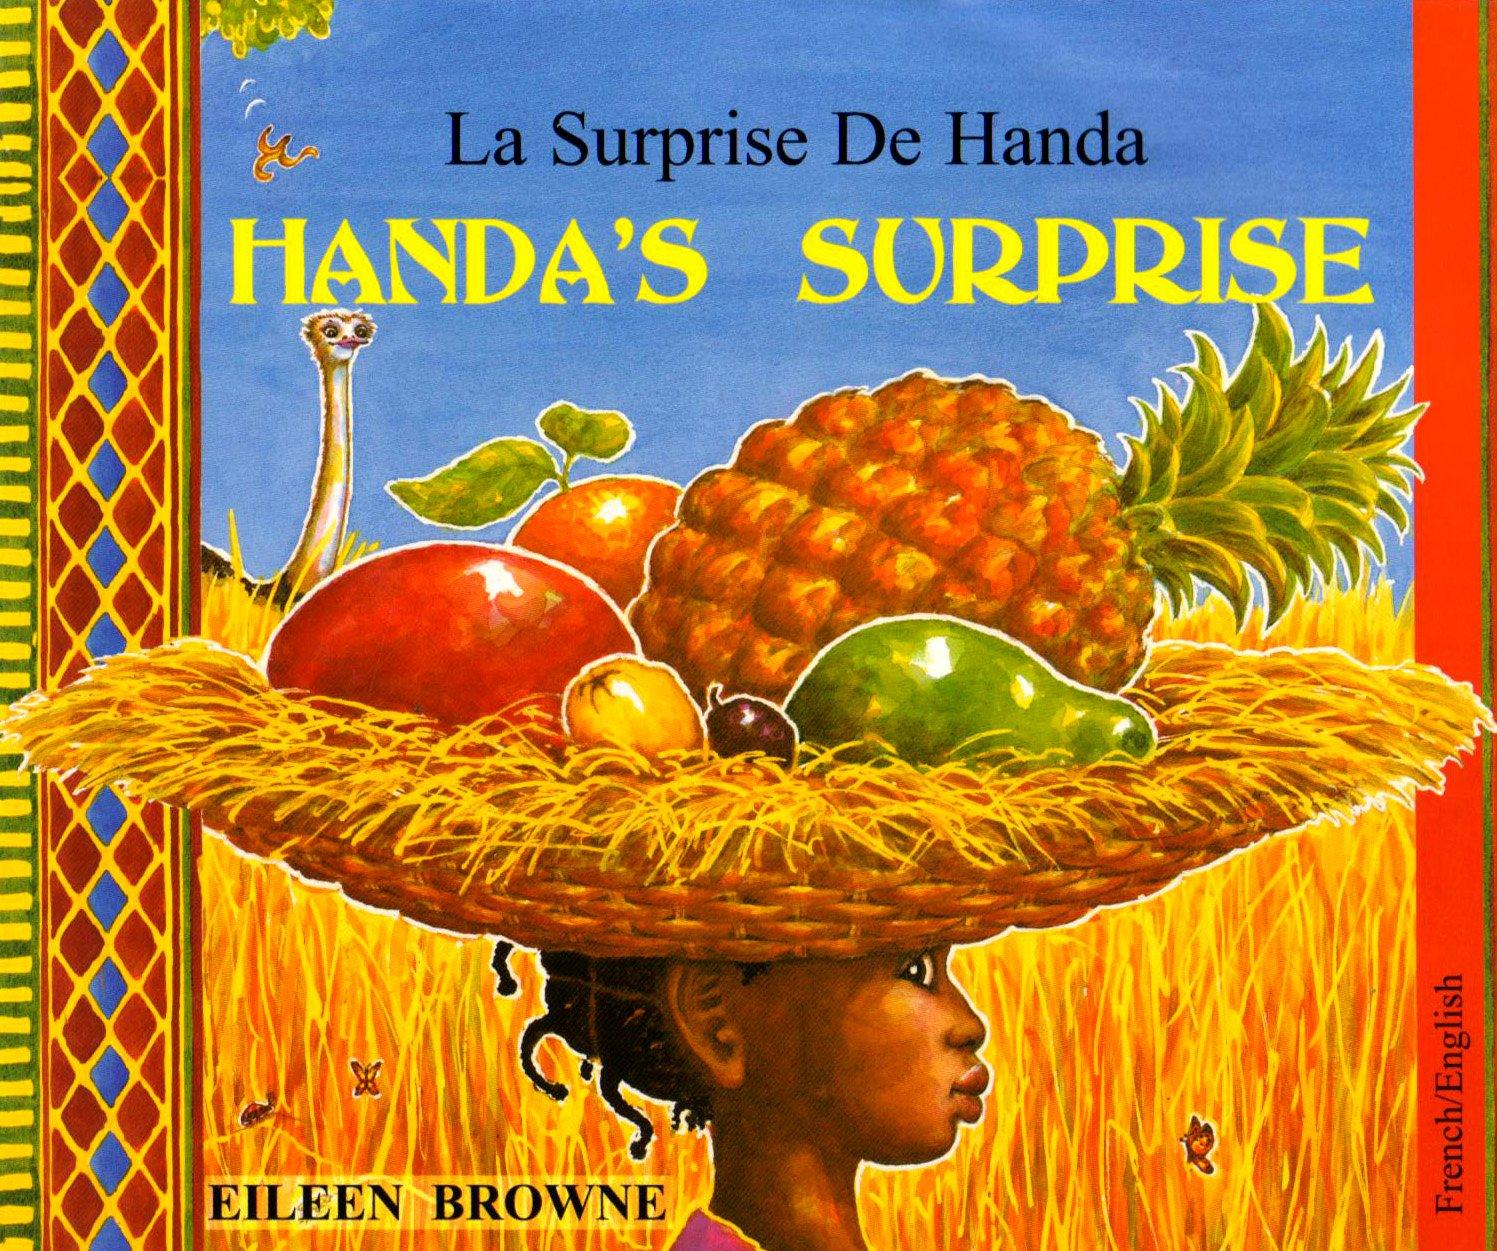 Handa's Surprise [French Version]: Amazon.co.uk: Browne, Eileen:  9781852695095: Books